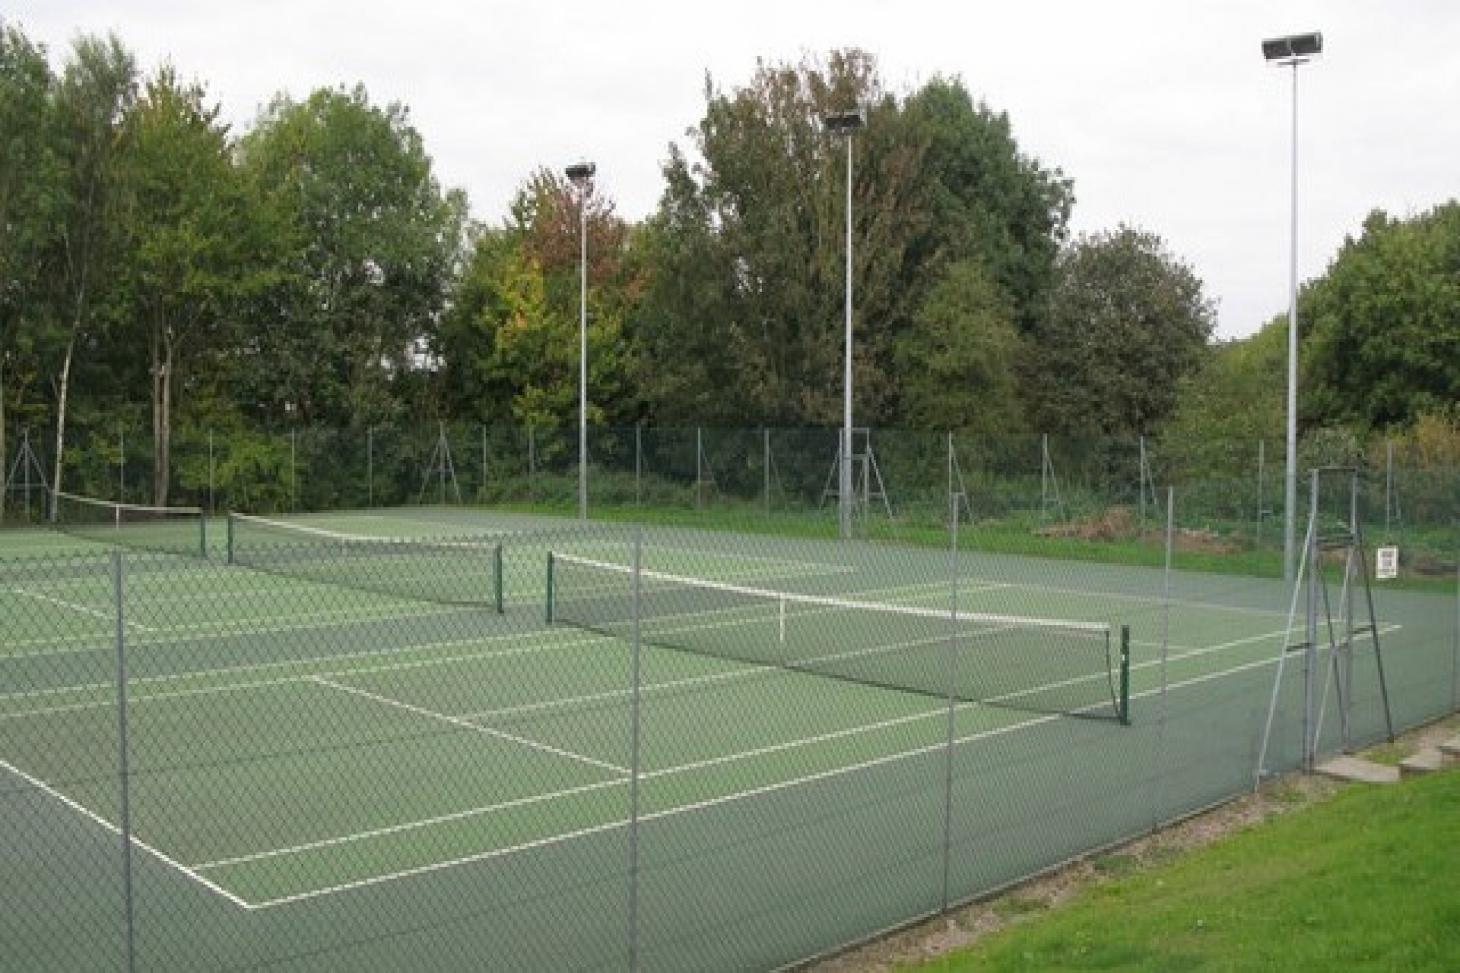 Walthamstow Cricket, Tennis And Squash Club Outdoor   Hard (macadam) tennis court